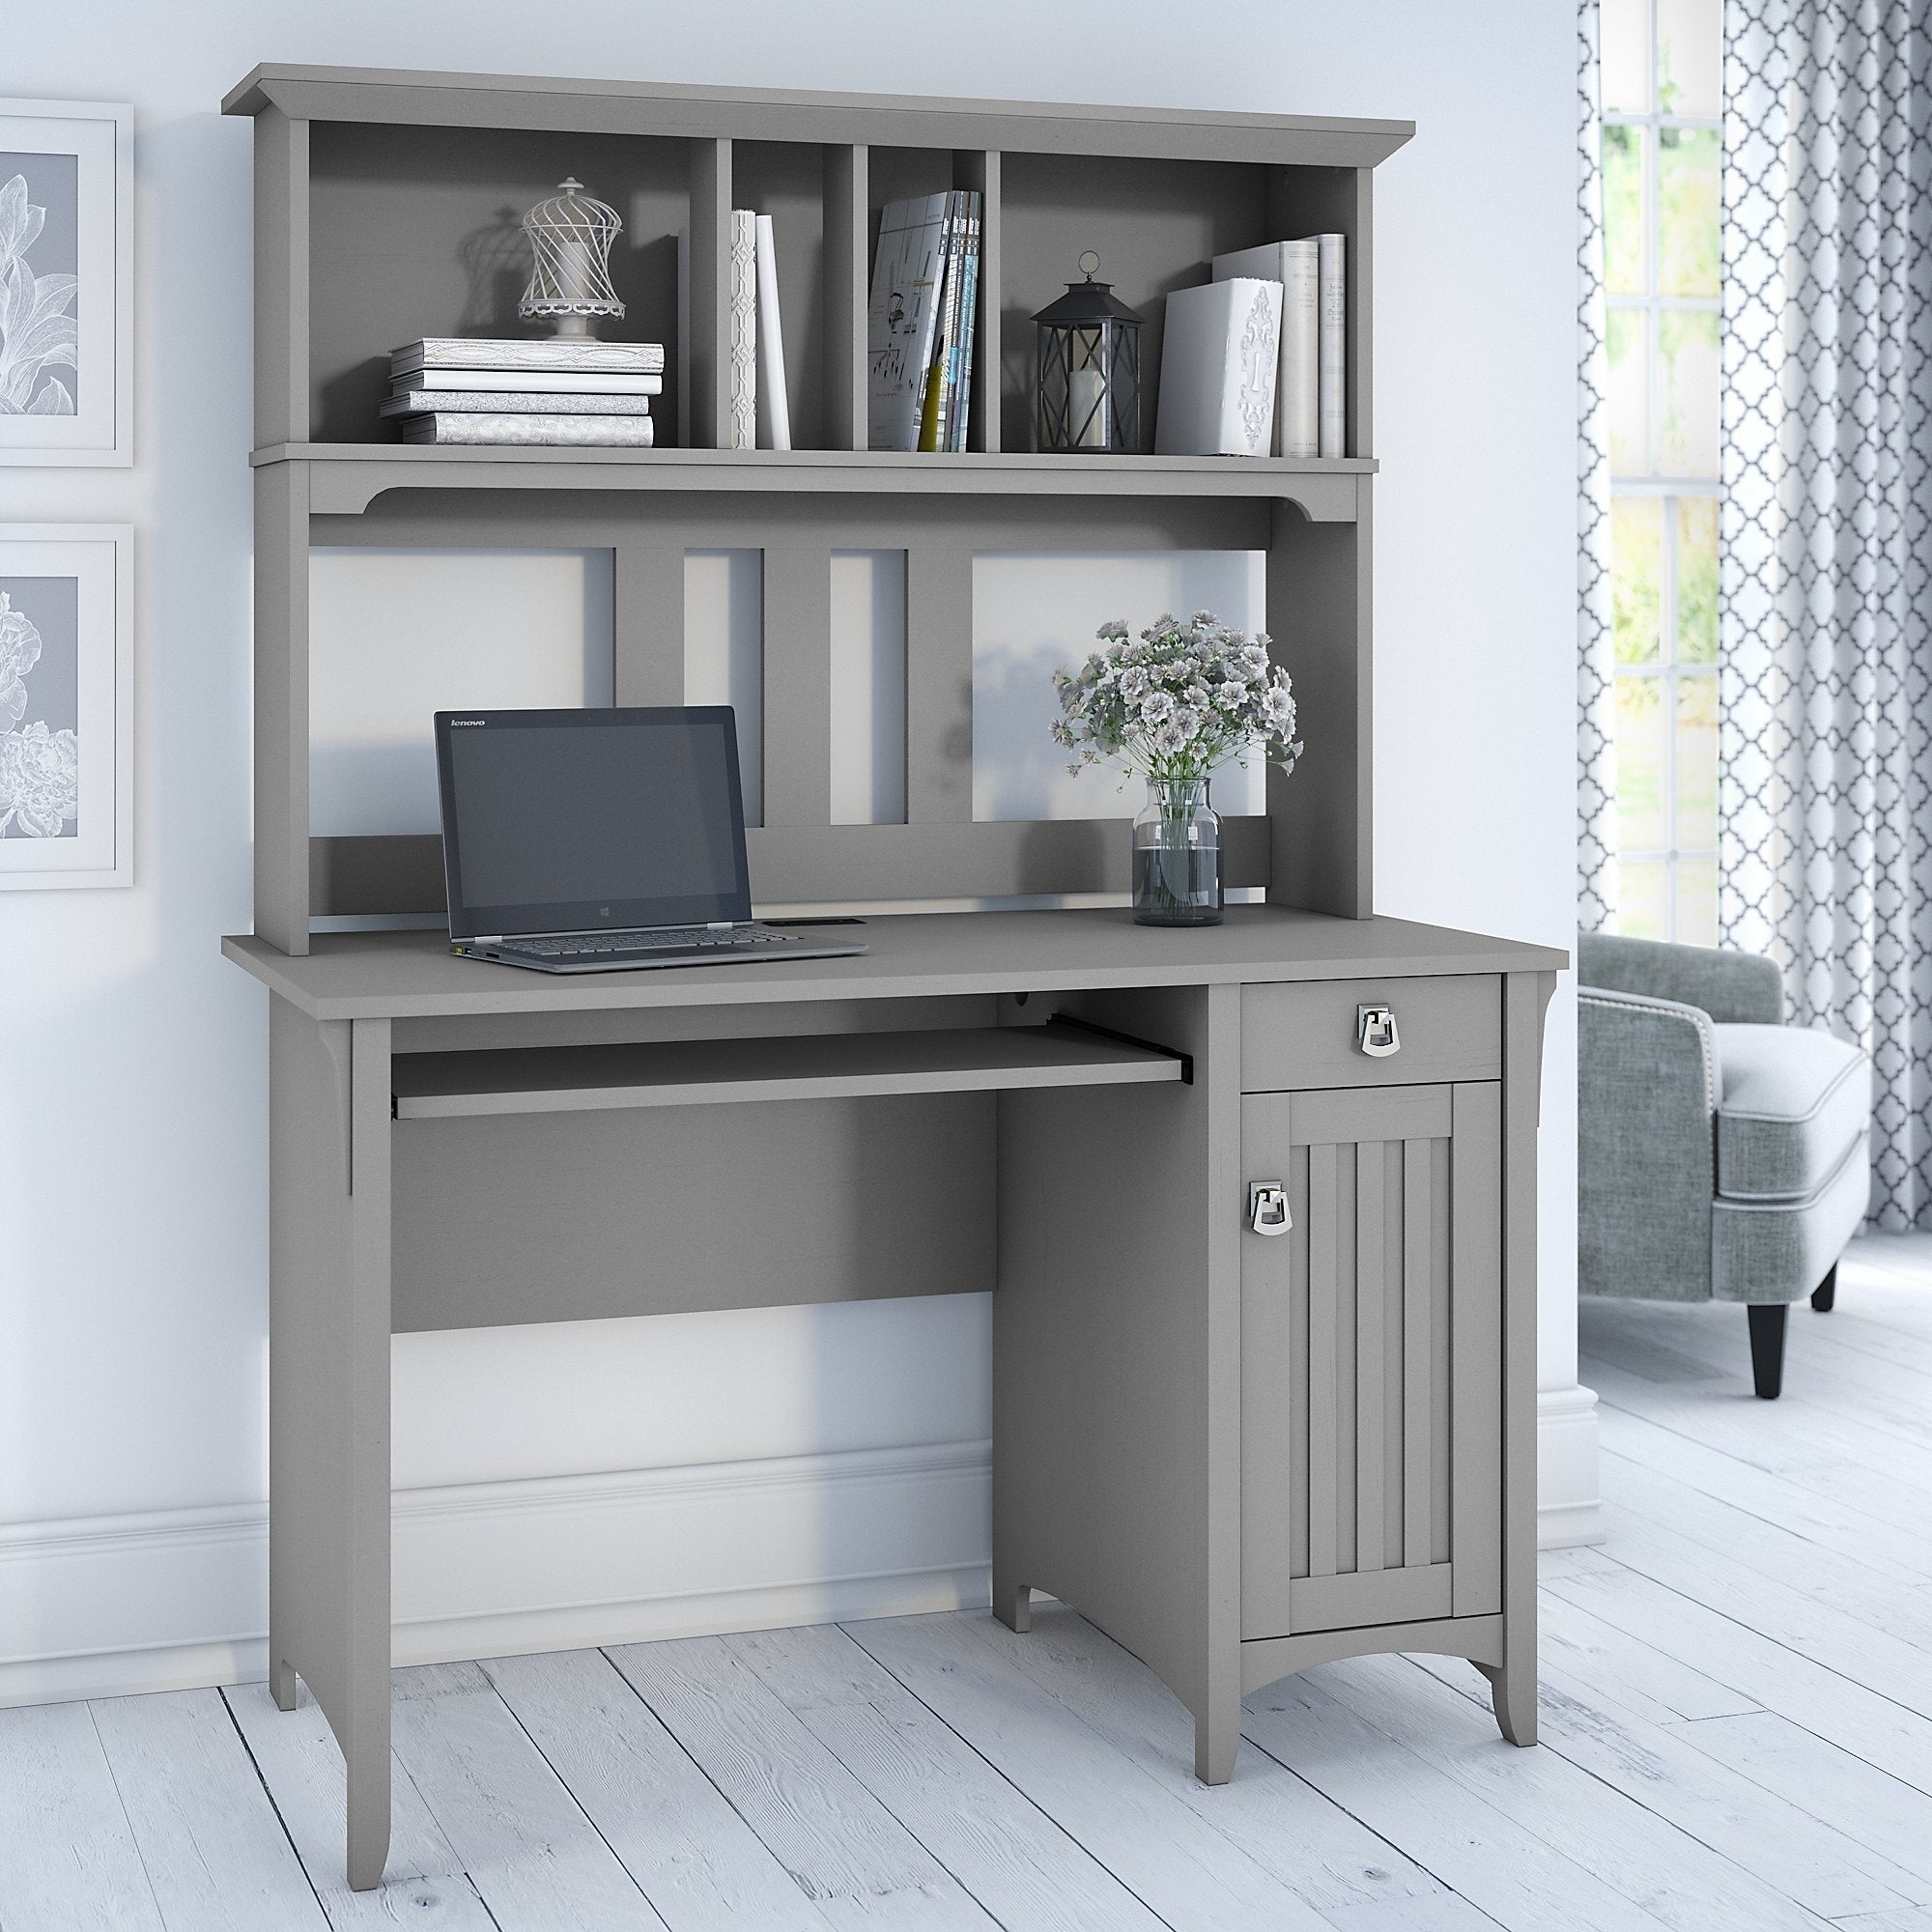 The Gray Barn Lowbridge Cape Cod Grey Computer Desk with Hutch